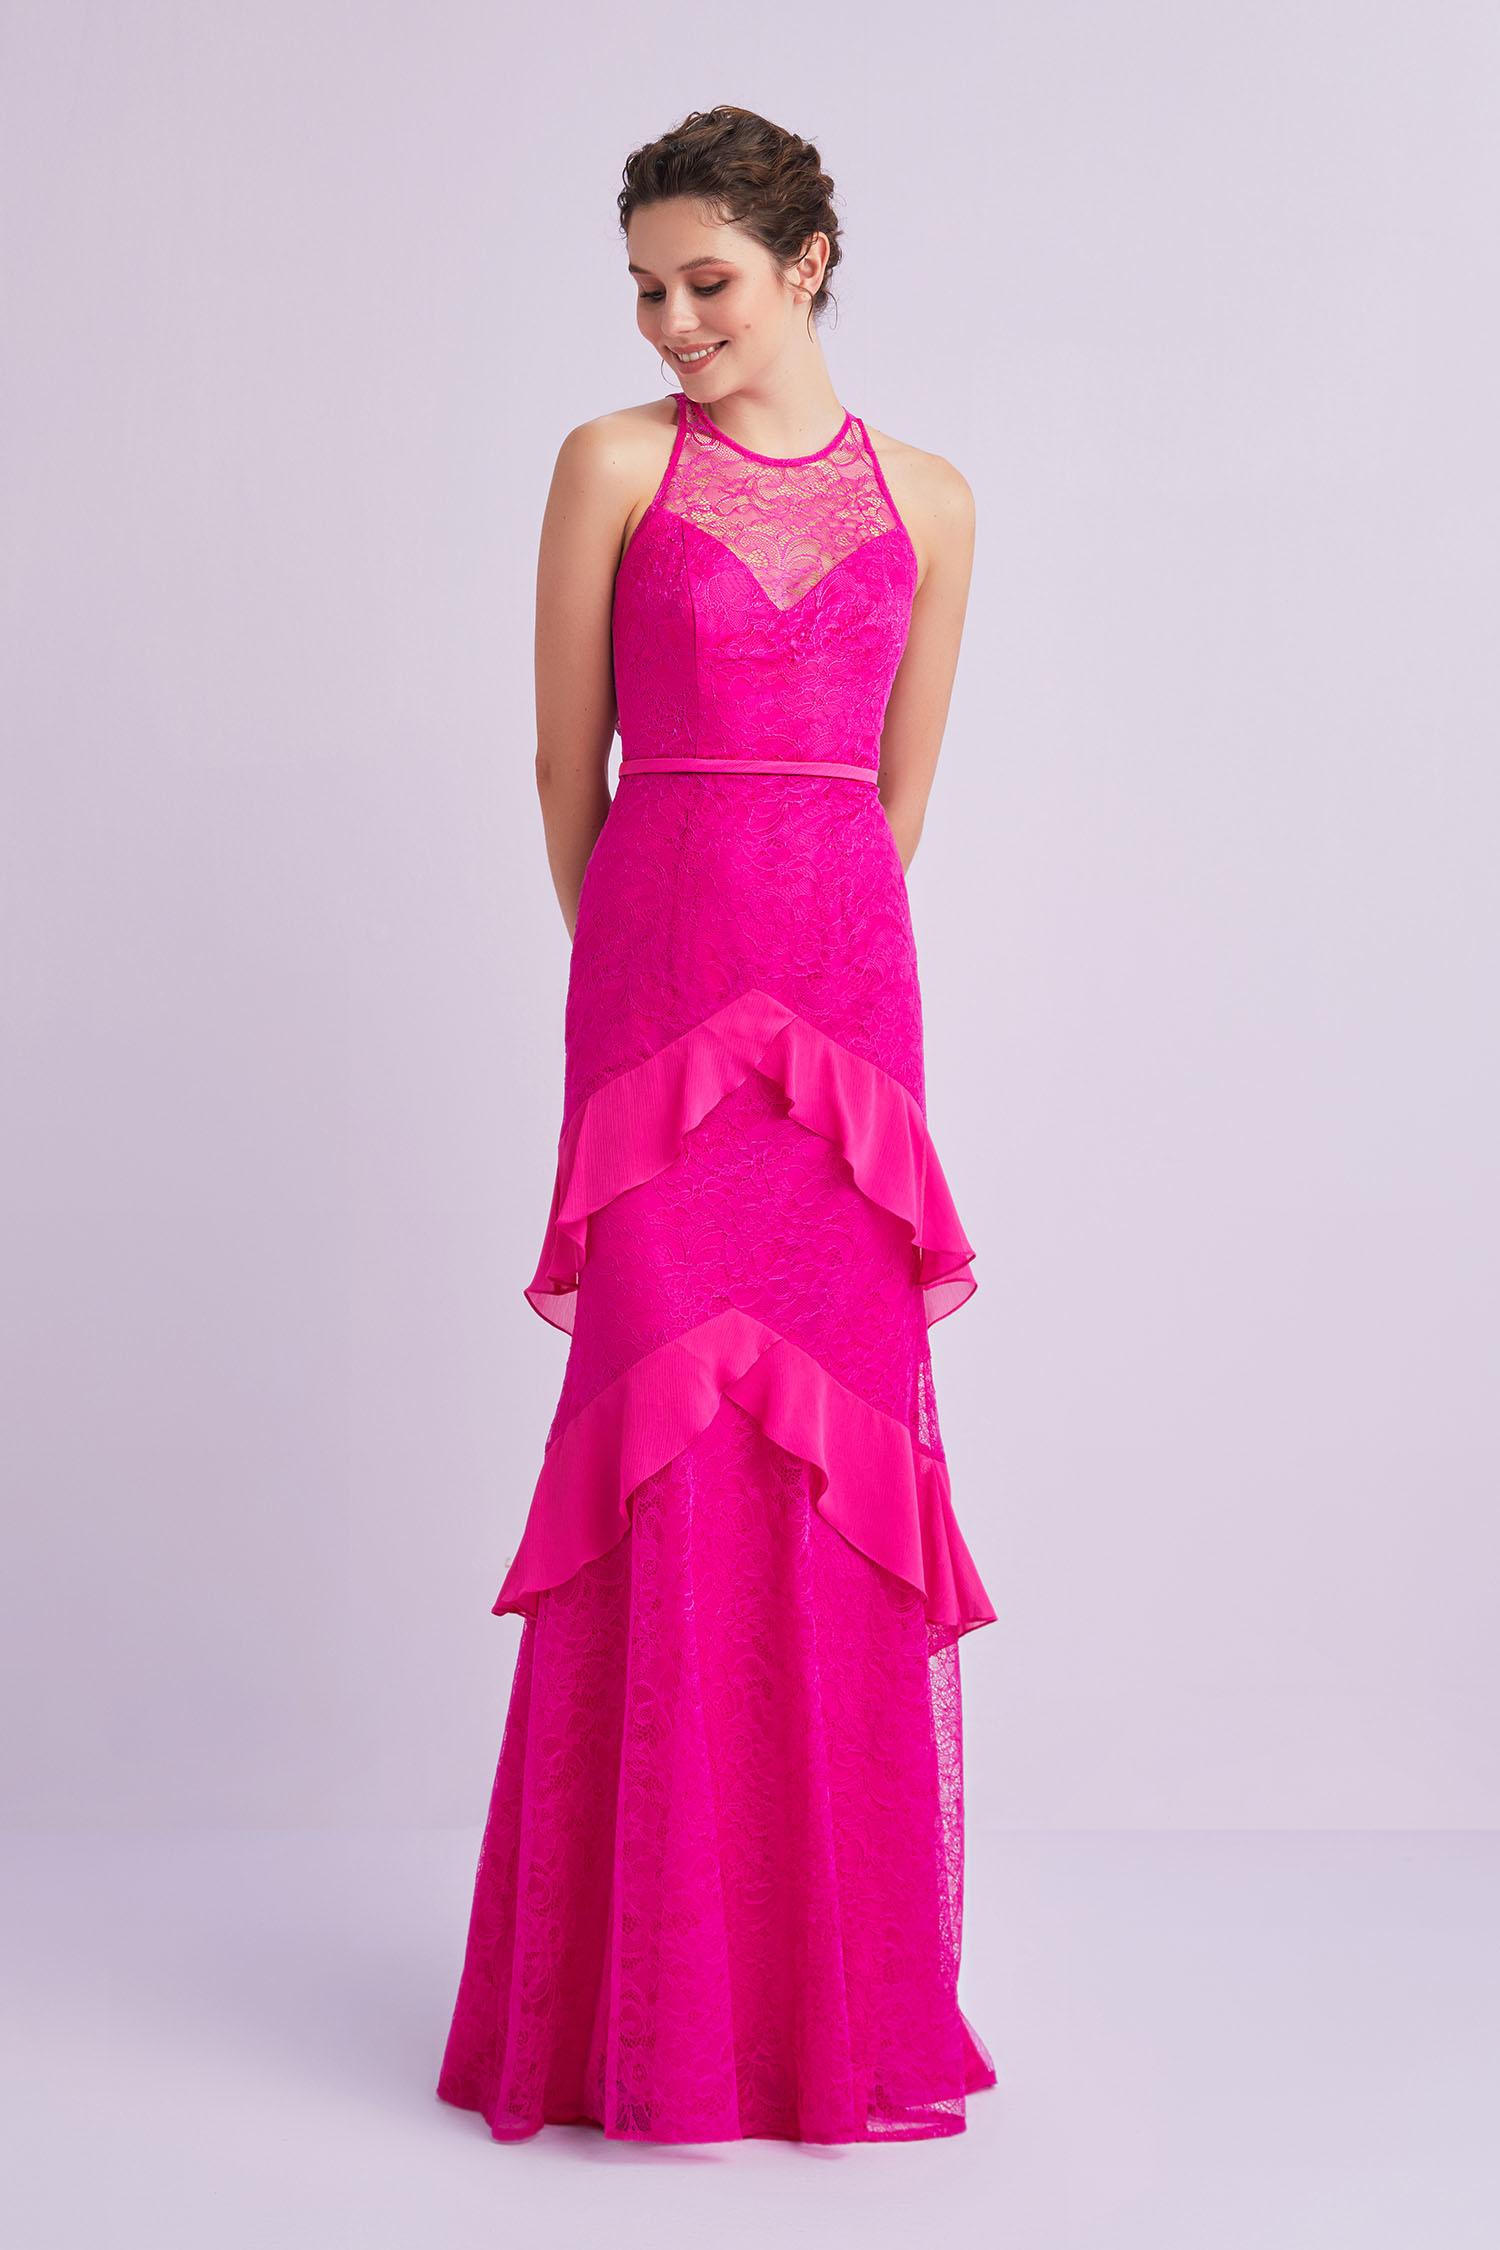 Neon Pembe İllüzyon Halter Yaka Uzun Abiye Elbise - Thumbnail